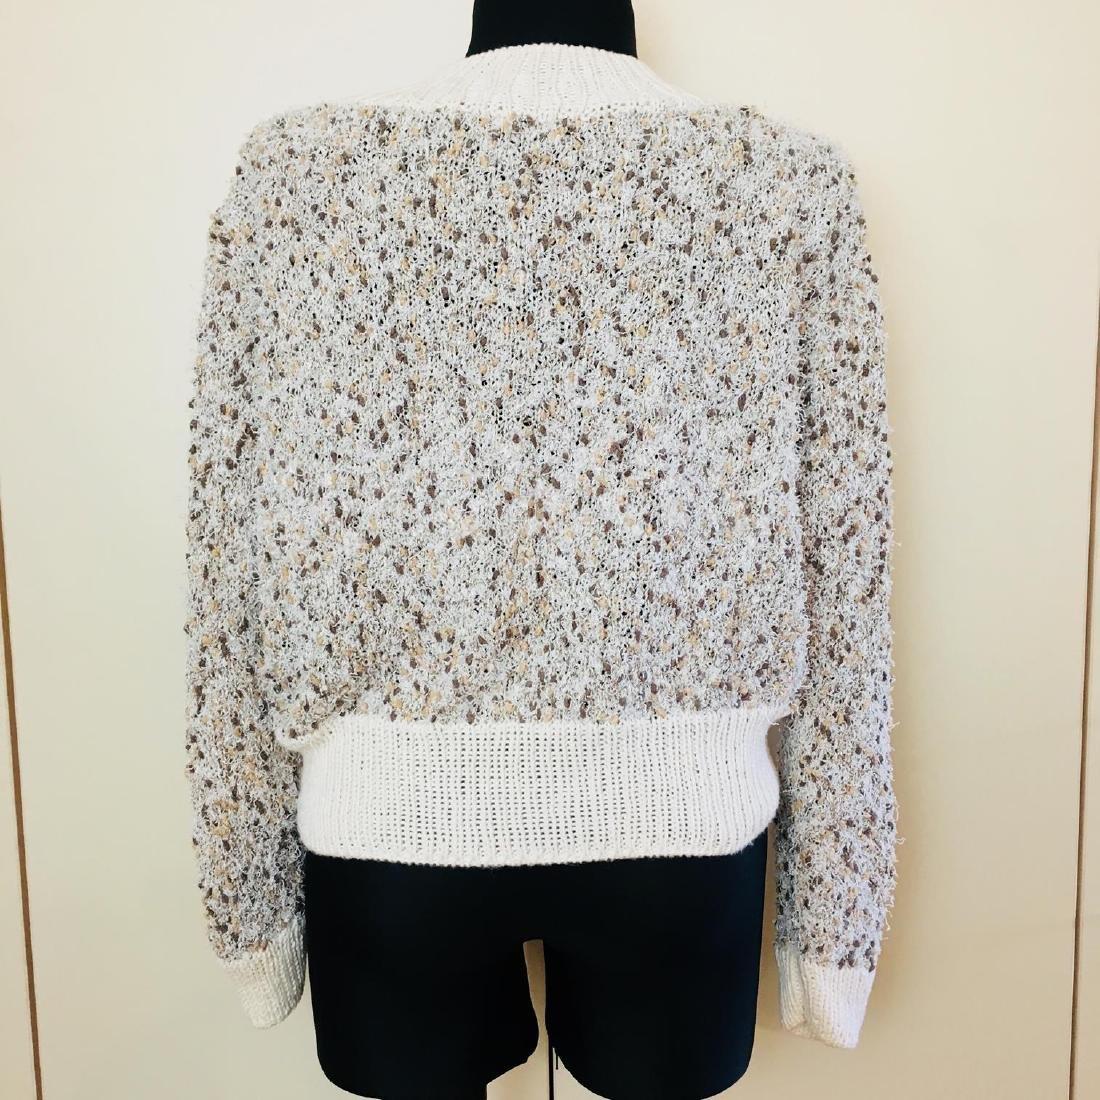 Vintage Women's Fluffy Sweater Jumper Size US 14 - 5